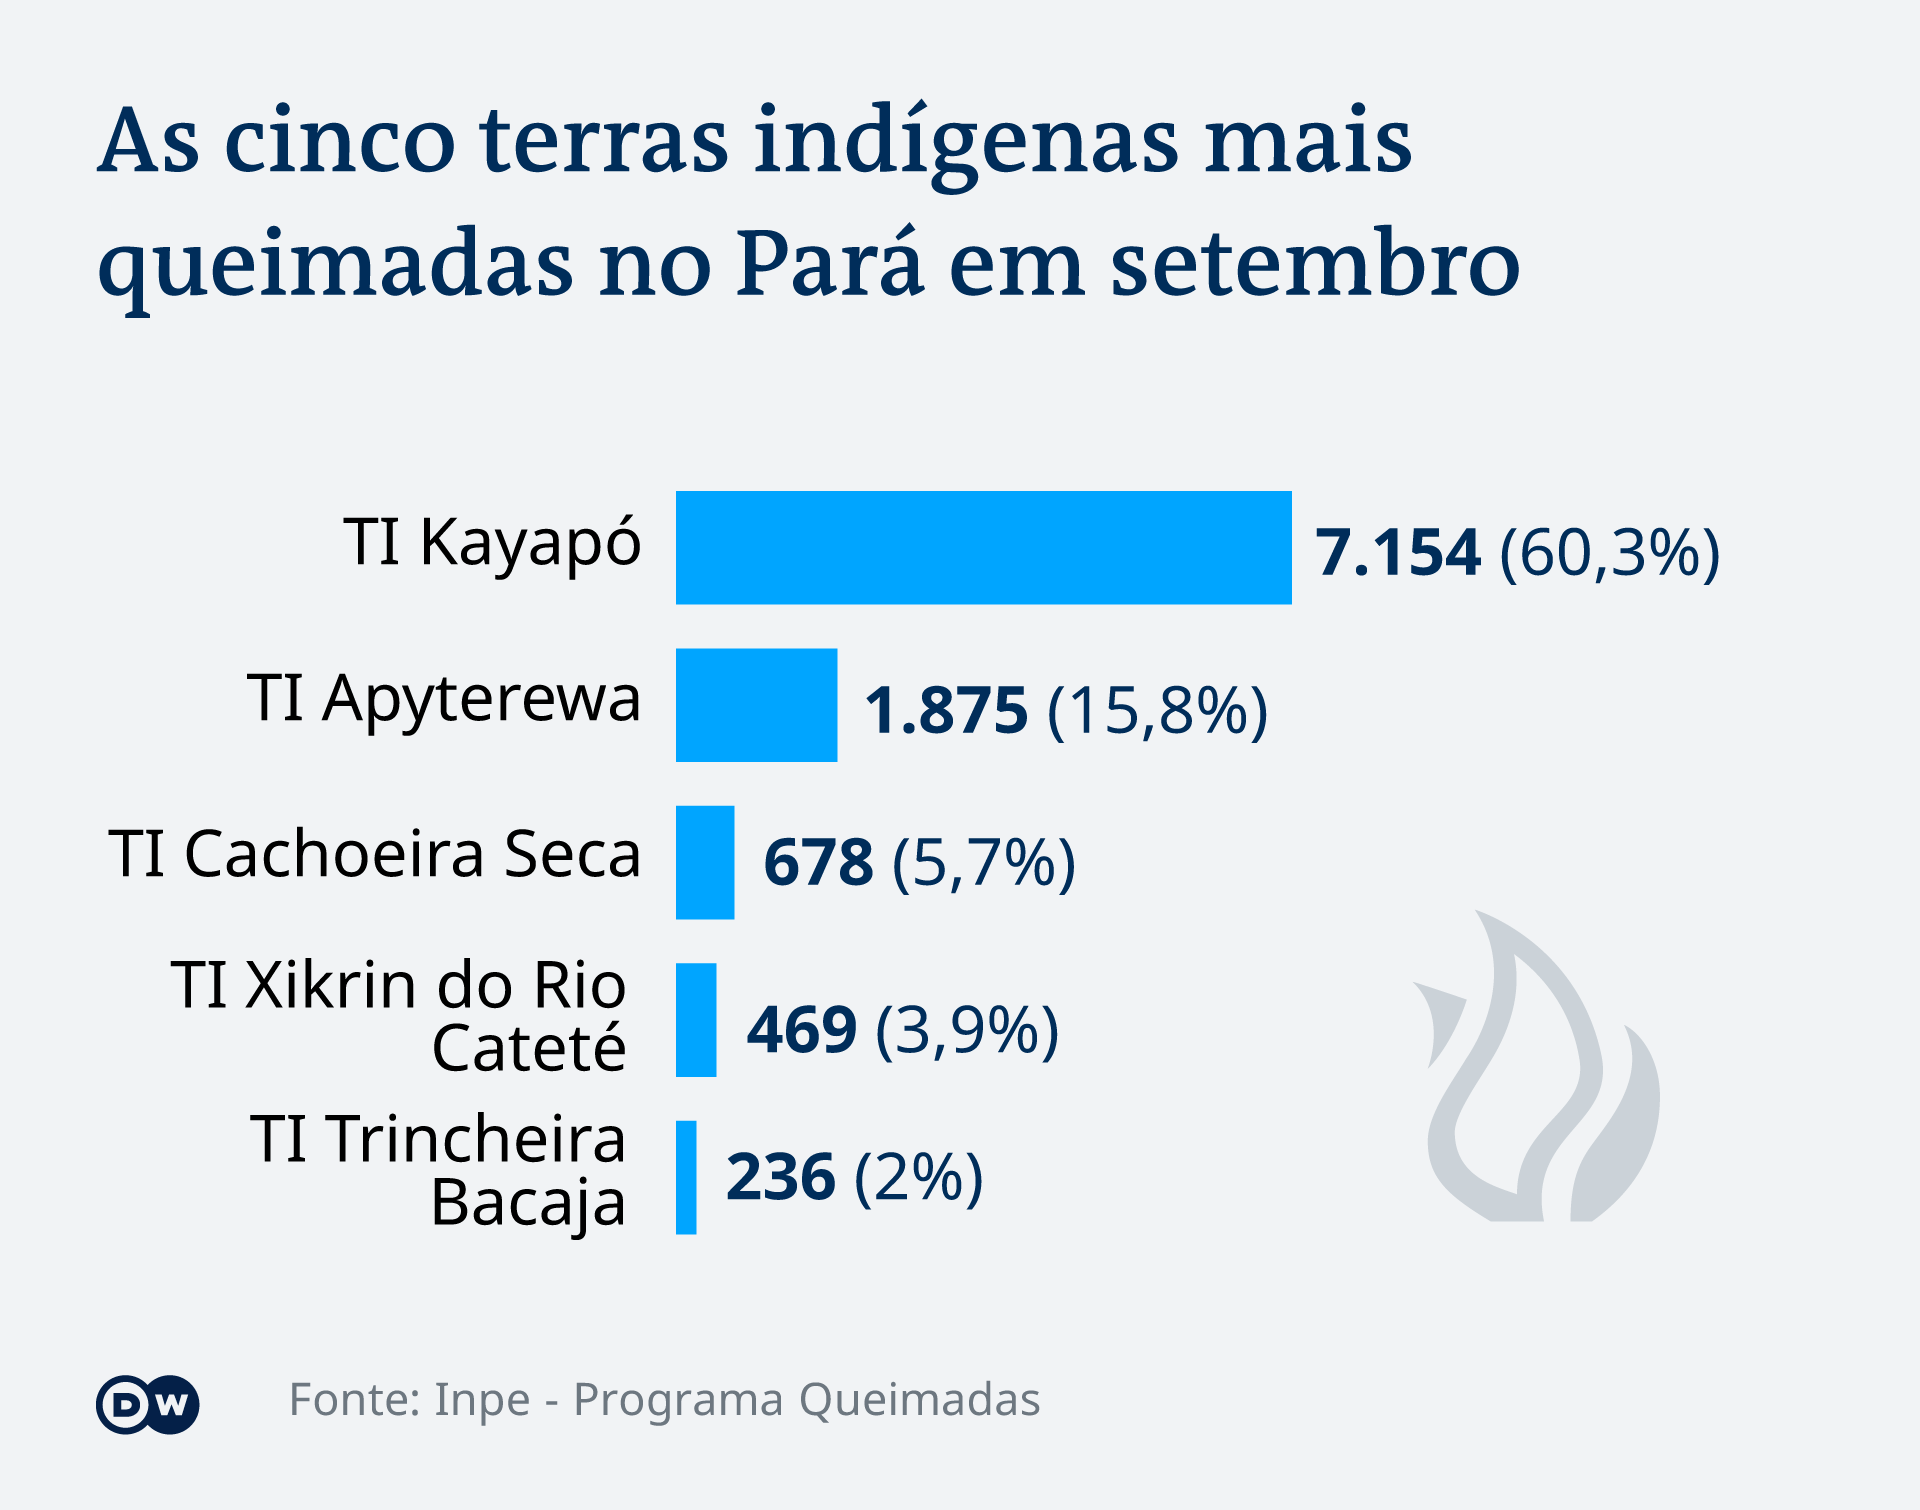 Infografik Brände in indigenen Gebieten Brasilien PT